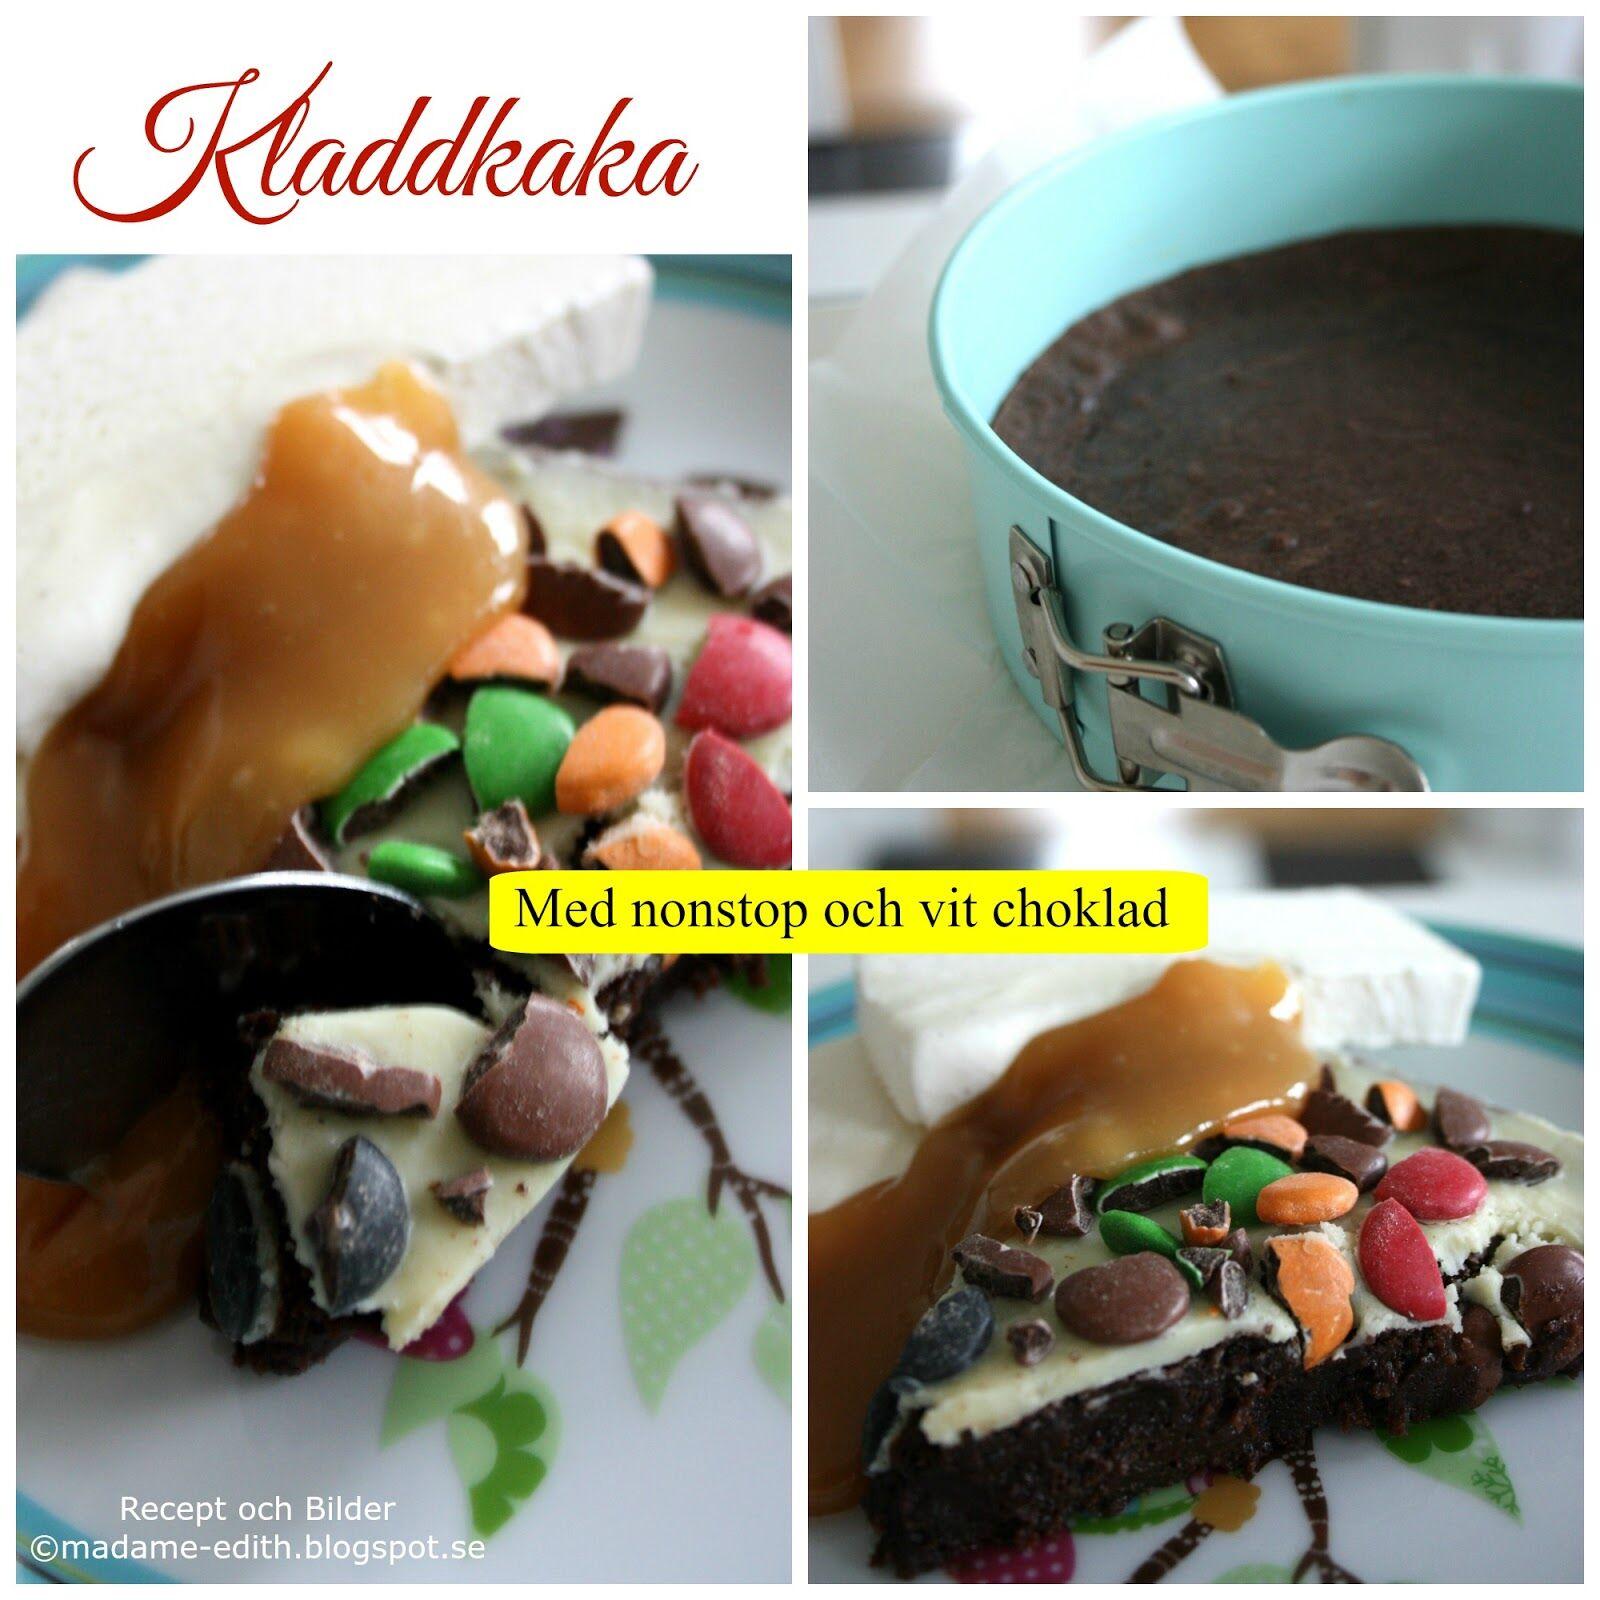 kladdkaka vit choklad (3)